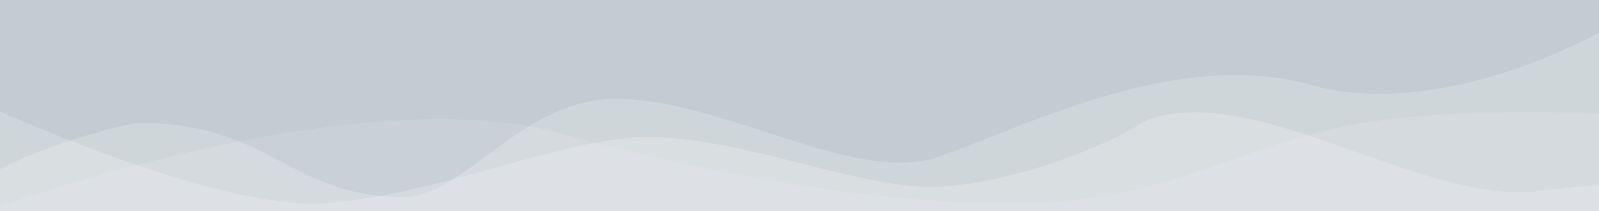 vacature header image